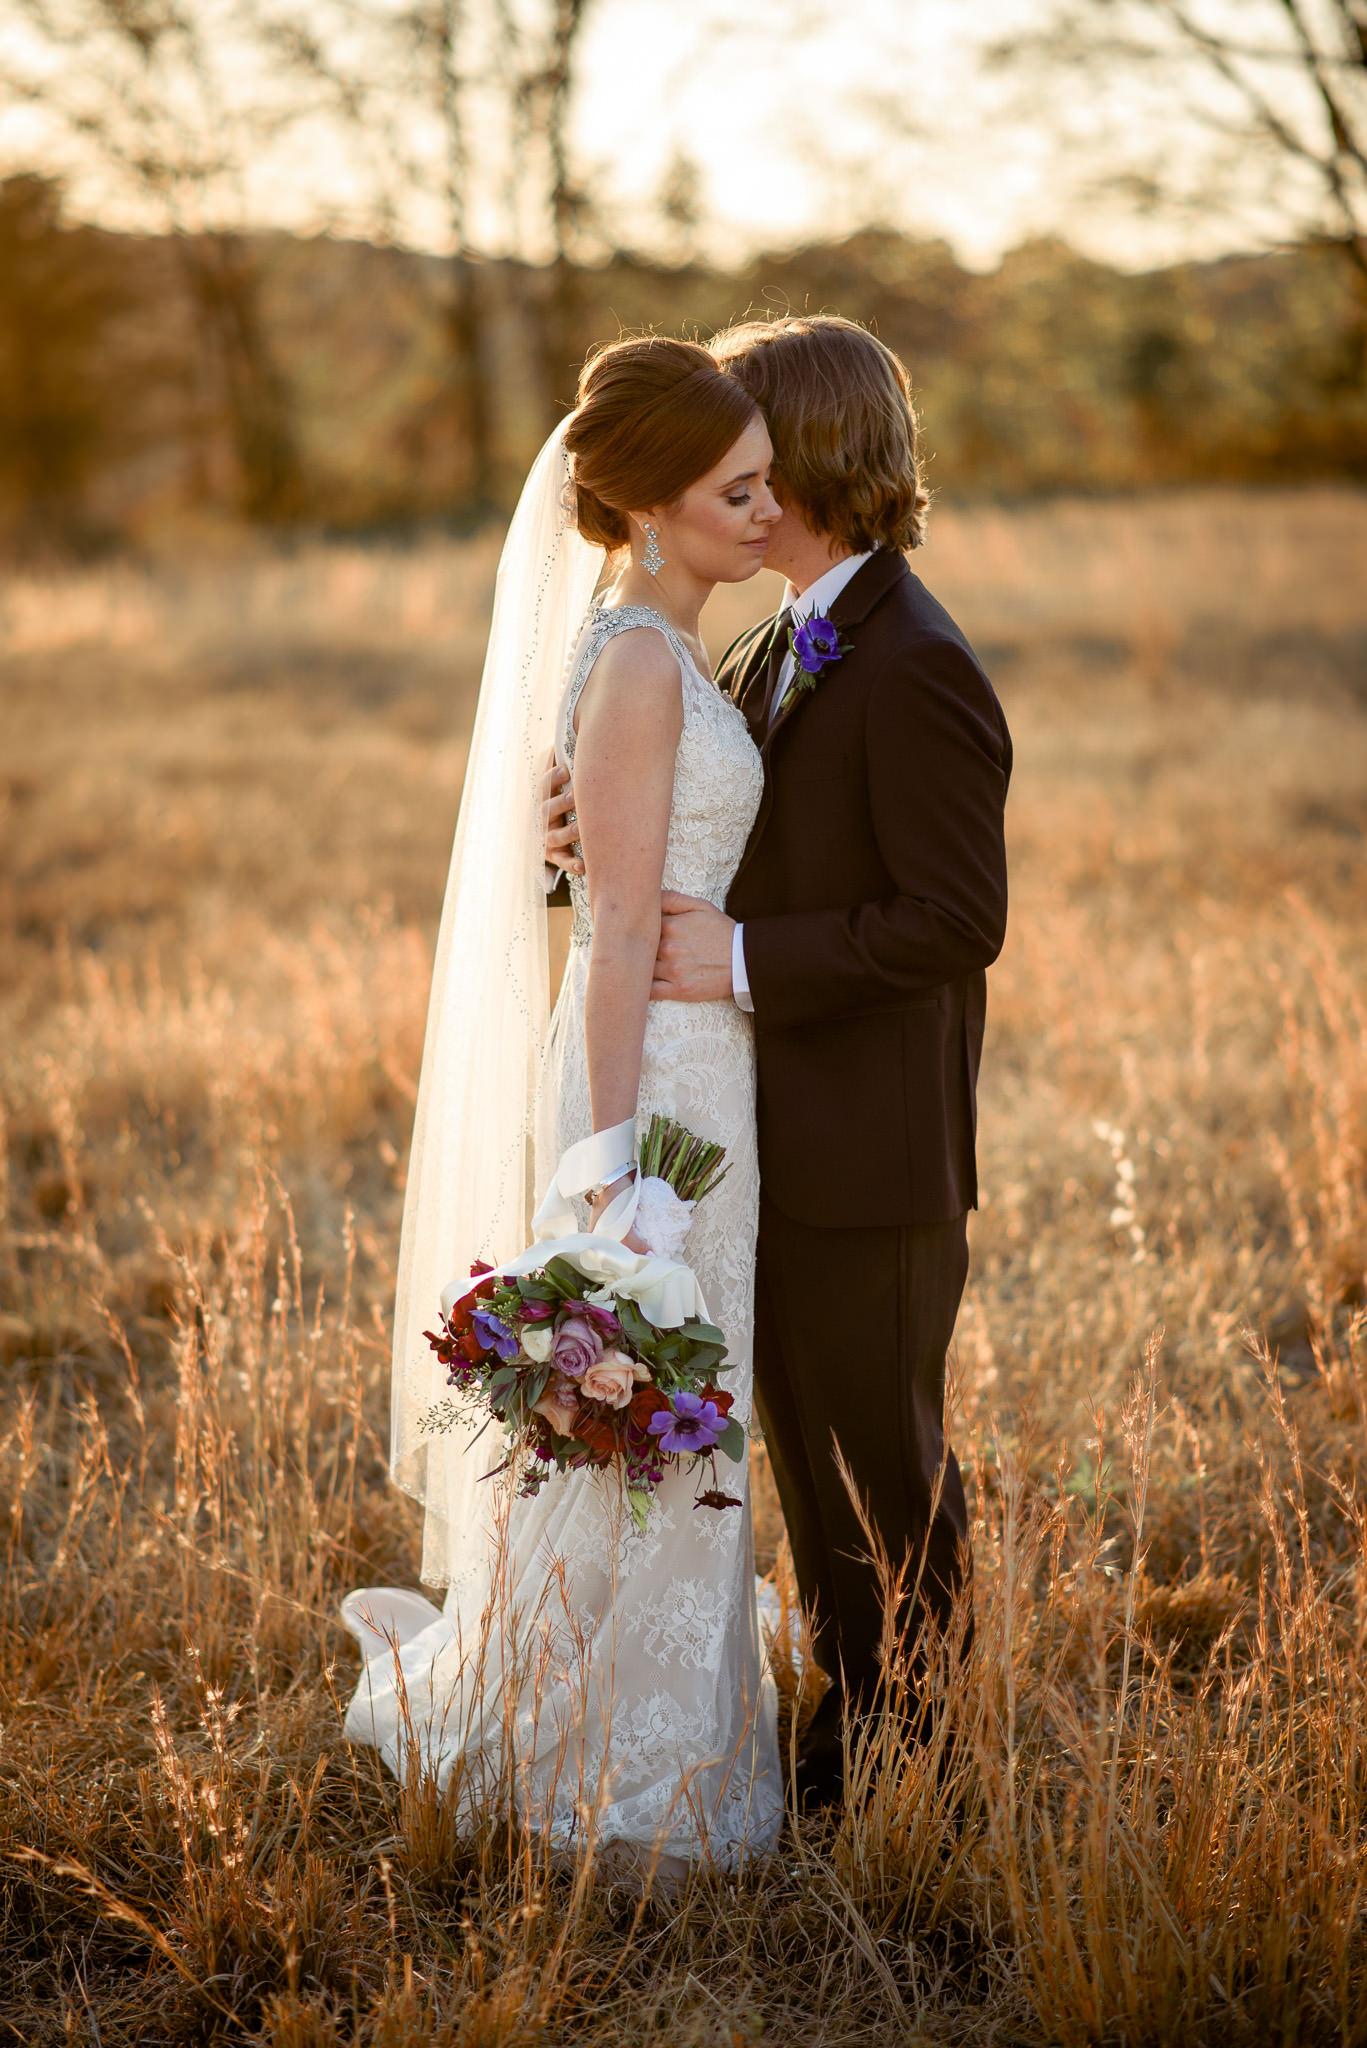 Greg and Jess Photography Nashville Portrait and Wedding Photographer 78.jpg